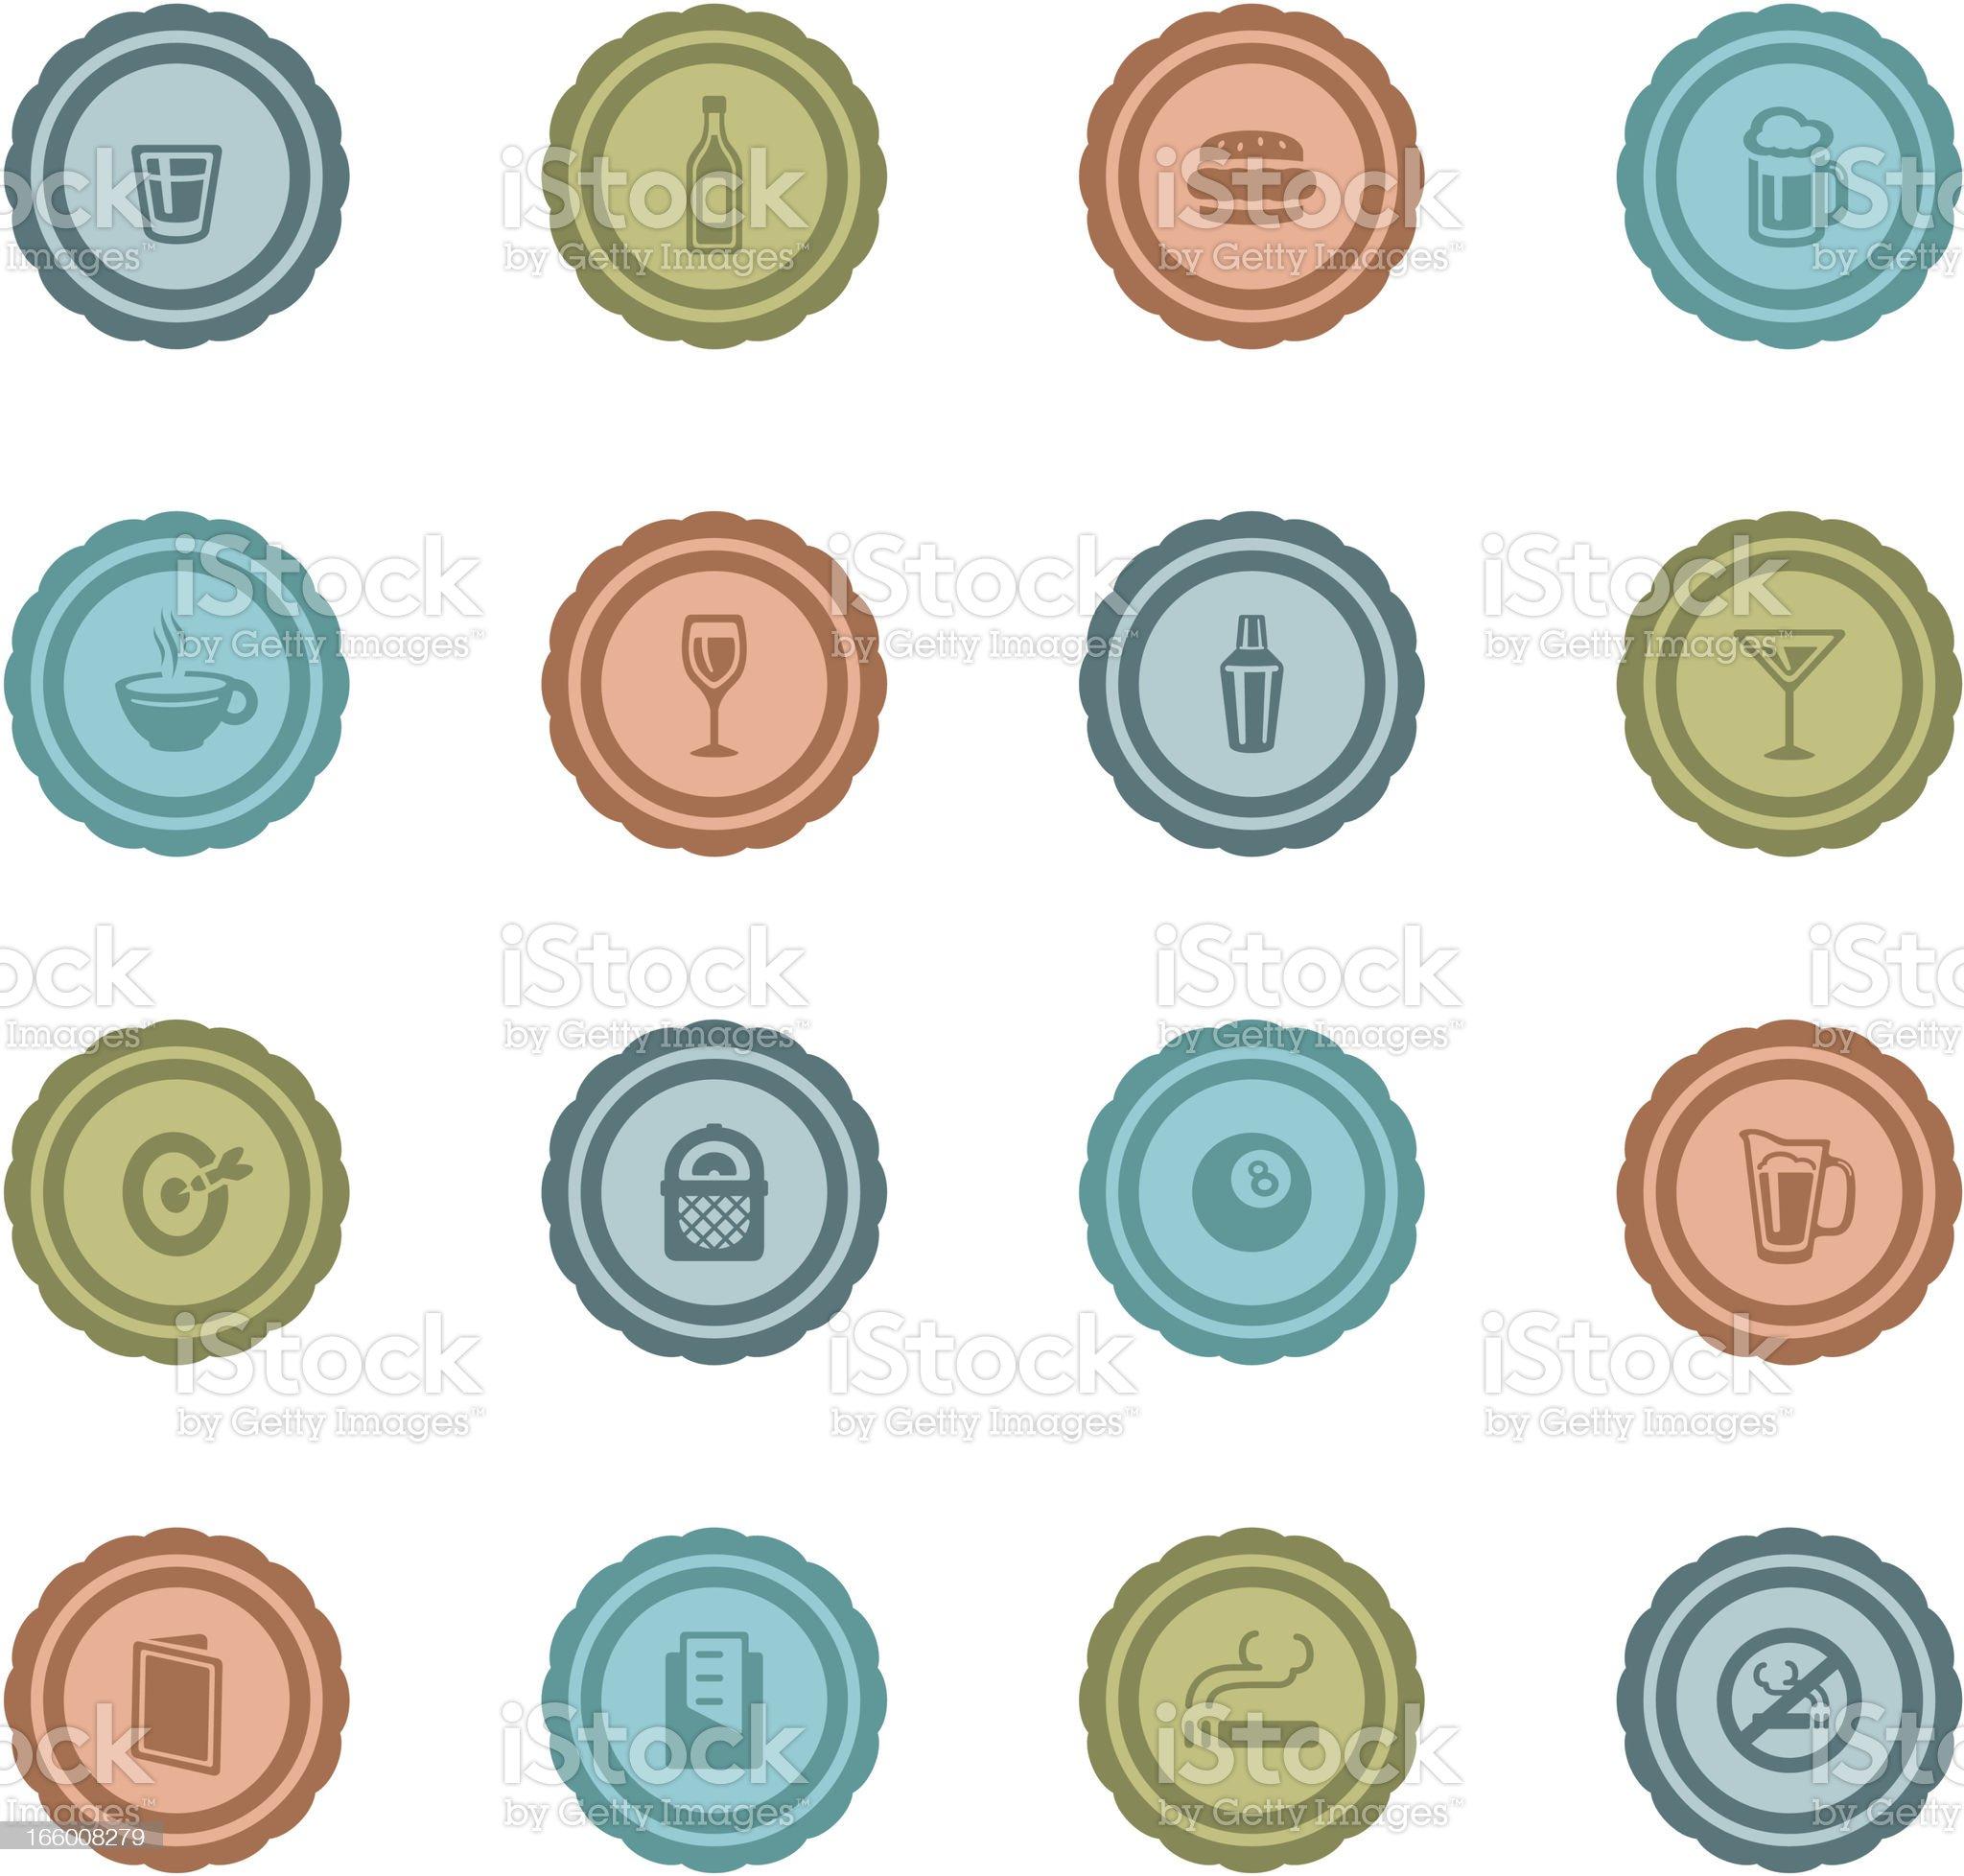 Retro Bar Badges royalty-free stock vector art